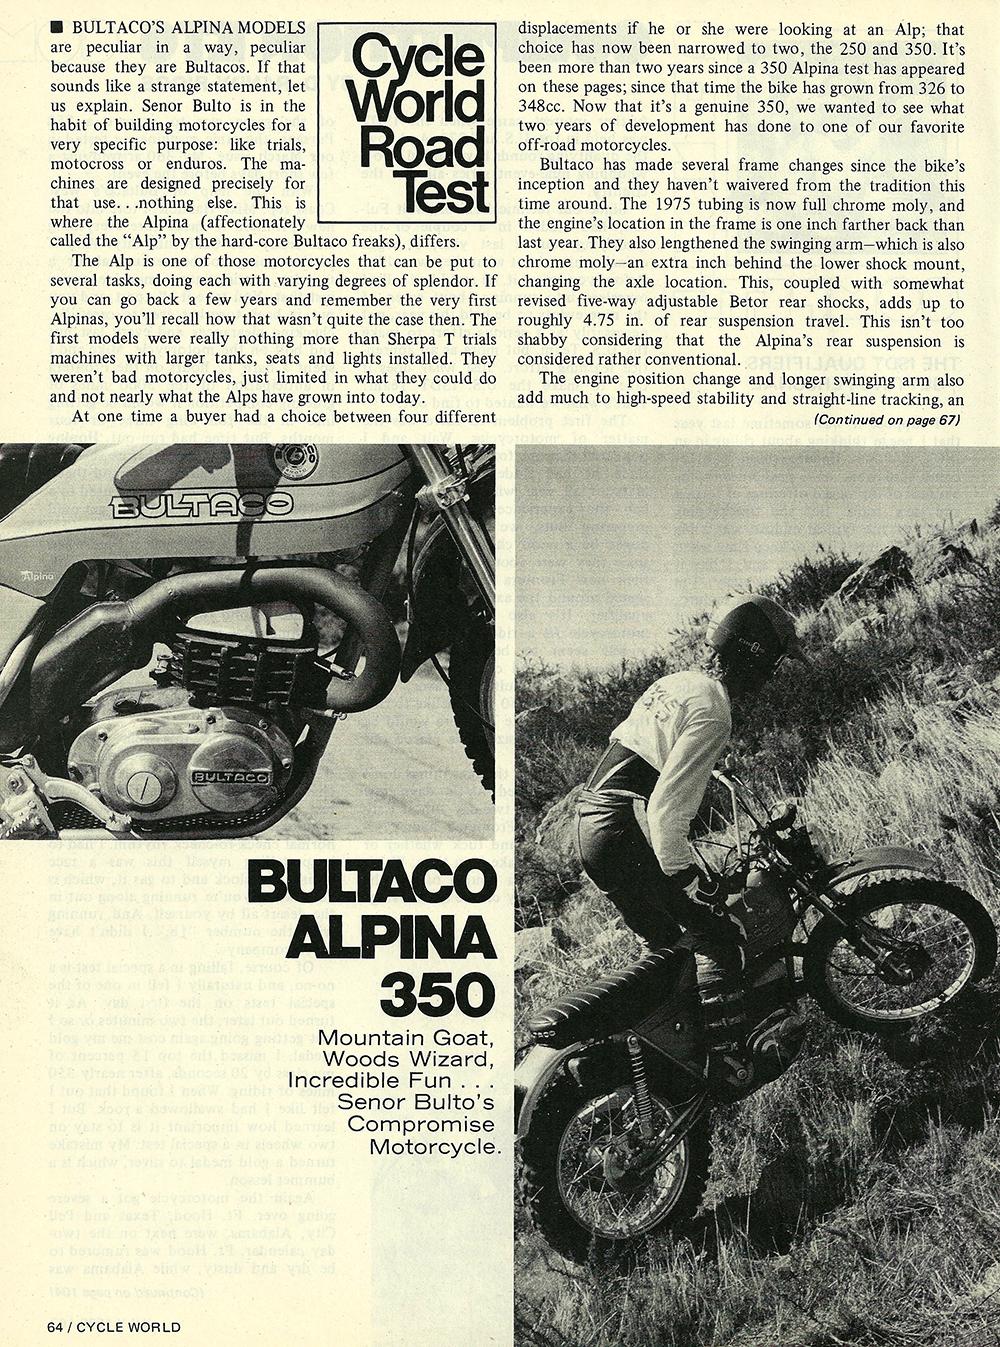 1975 Bultaco Alpina 350 road test 01.jpg